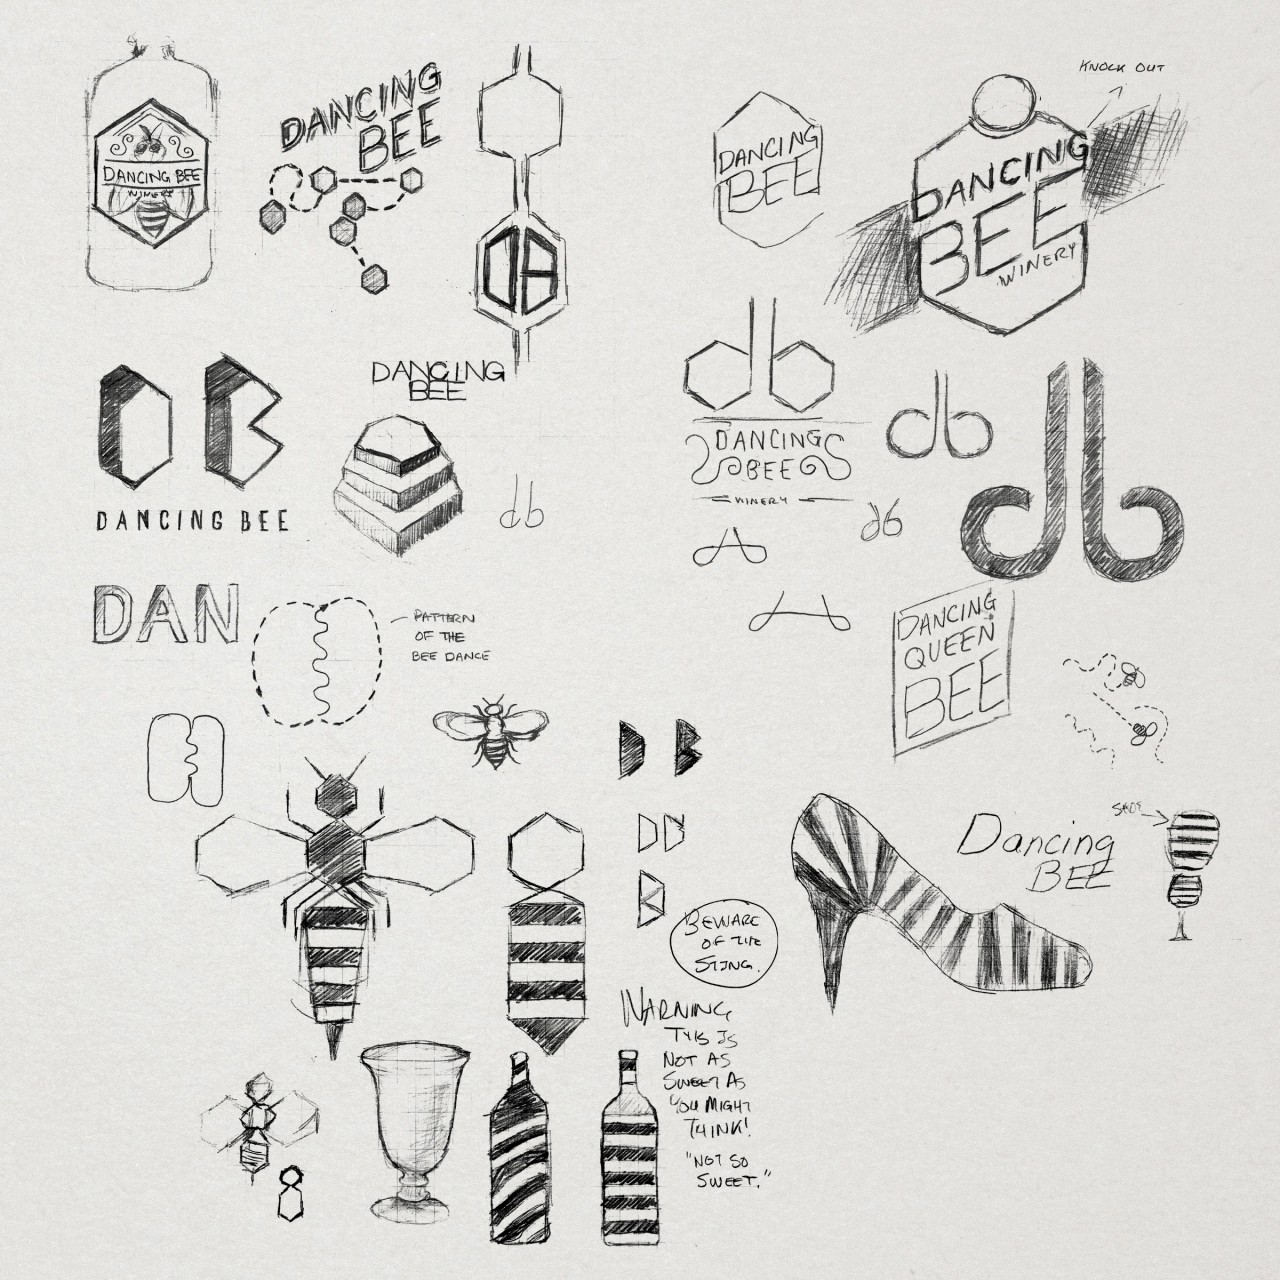 Image of Dancing Bee Winery logo design process work